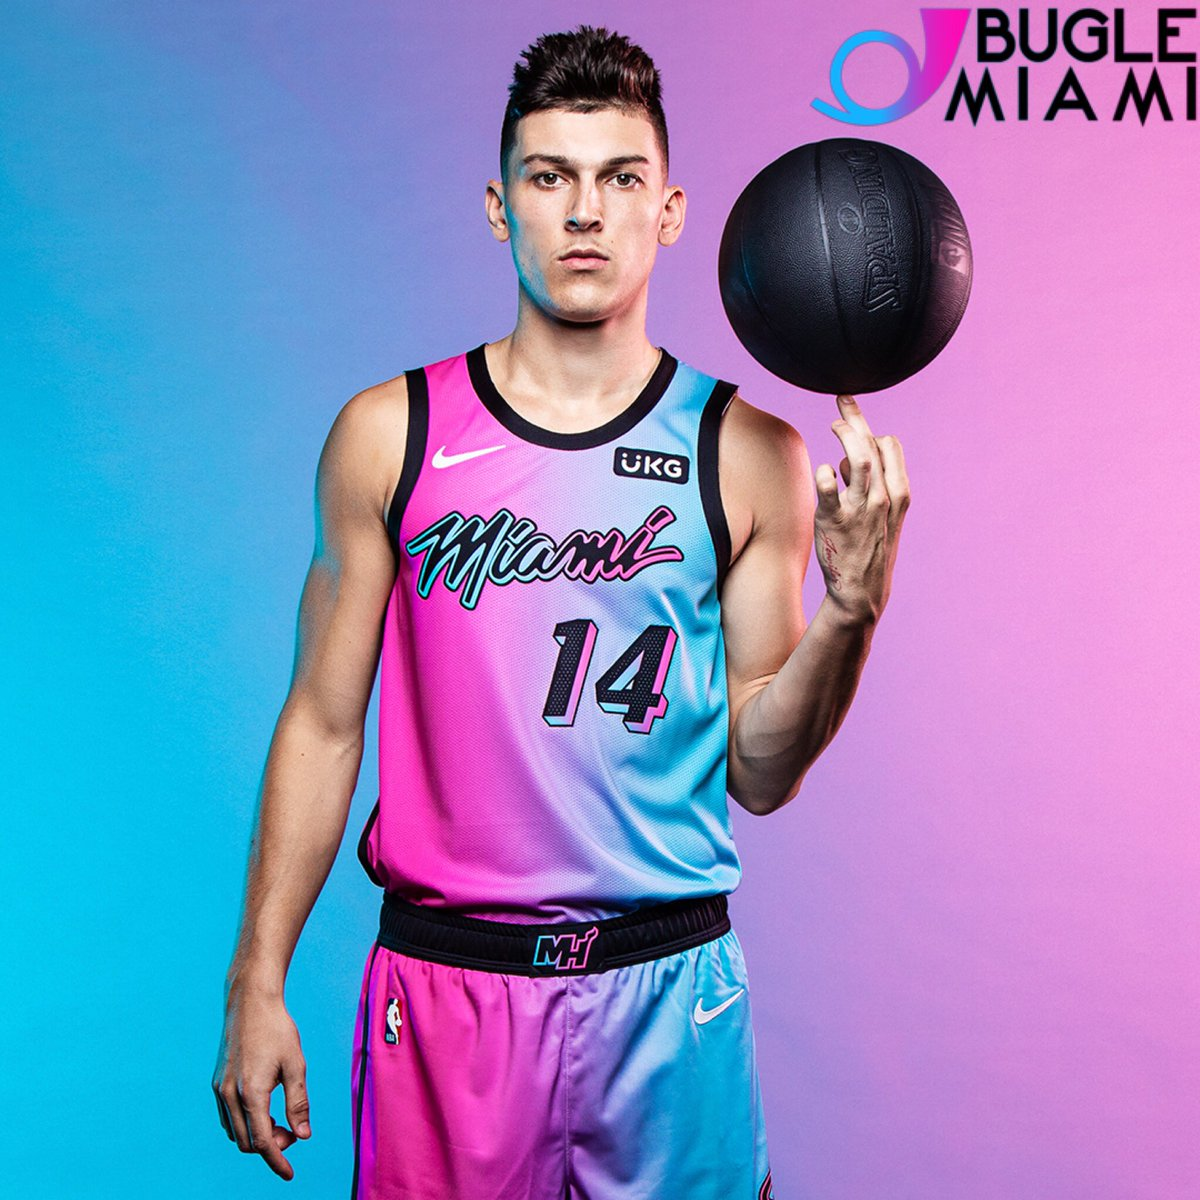 Nuevo uniforme del @MiamiHEAT para la temporada 2020-21.   Muy Bugle 🔥🤩  #BugleMiami #Miami #MiamiHeat #heatculture #sport #sportnews #news #localnews https://t.co/NSqeShIEPn